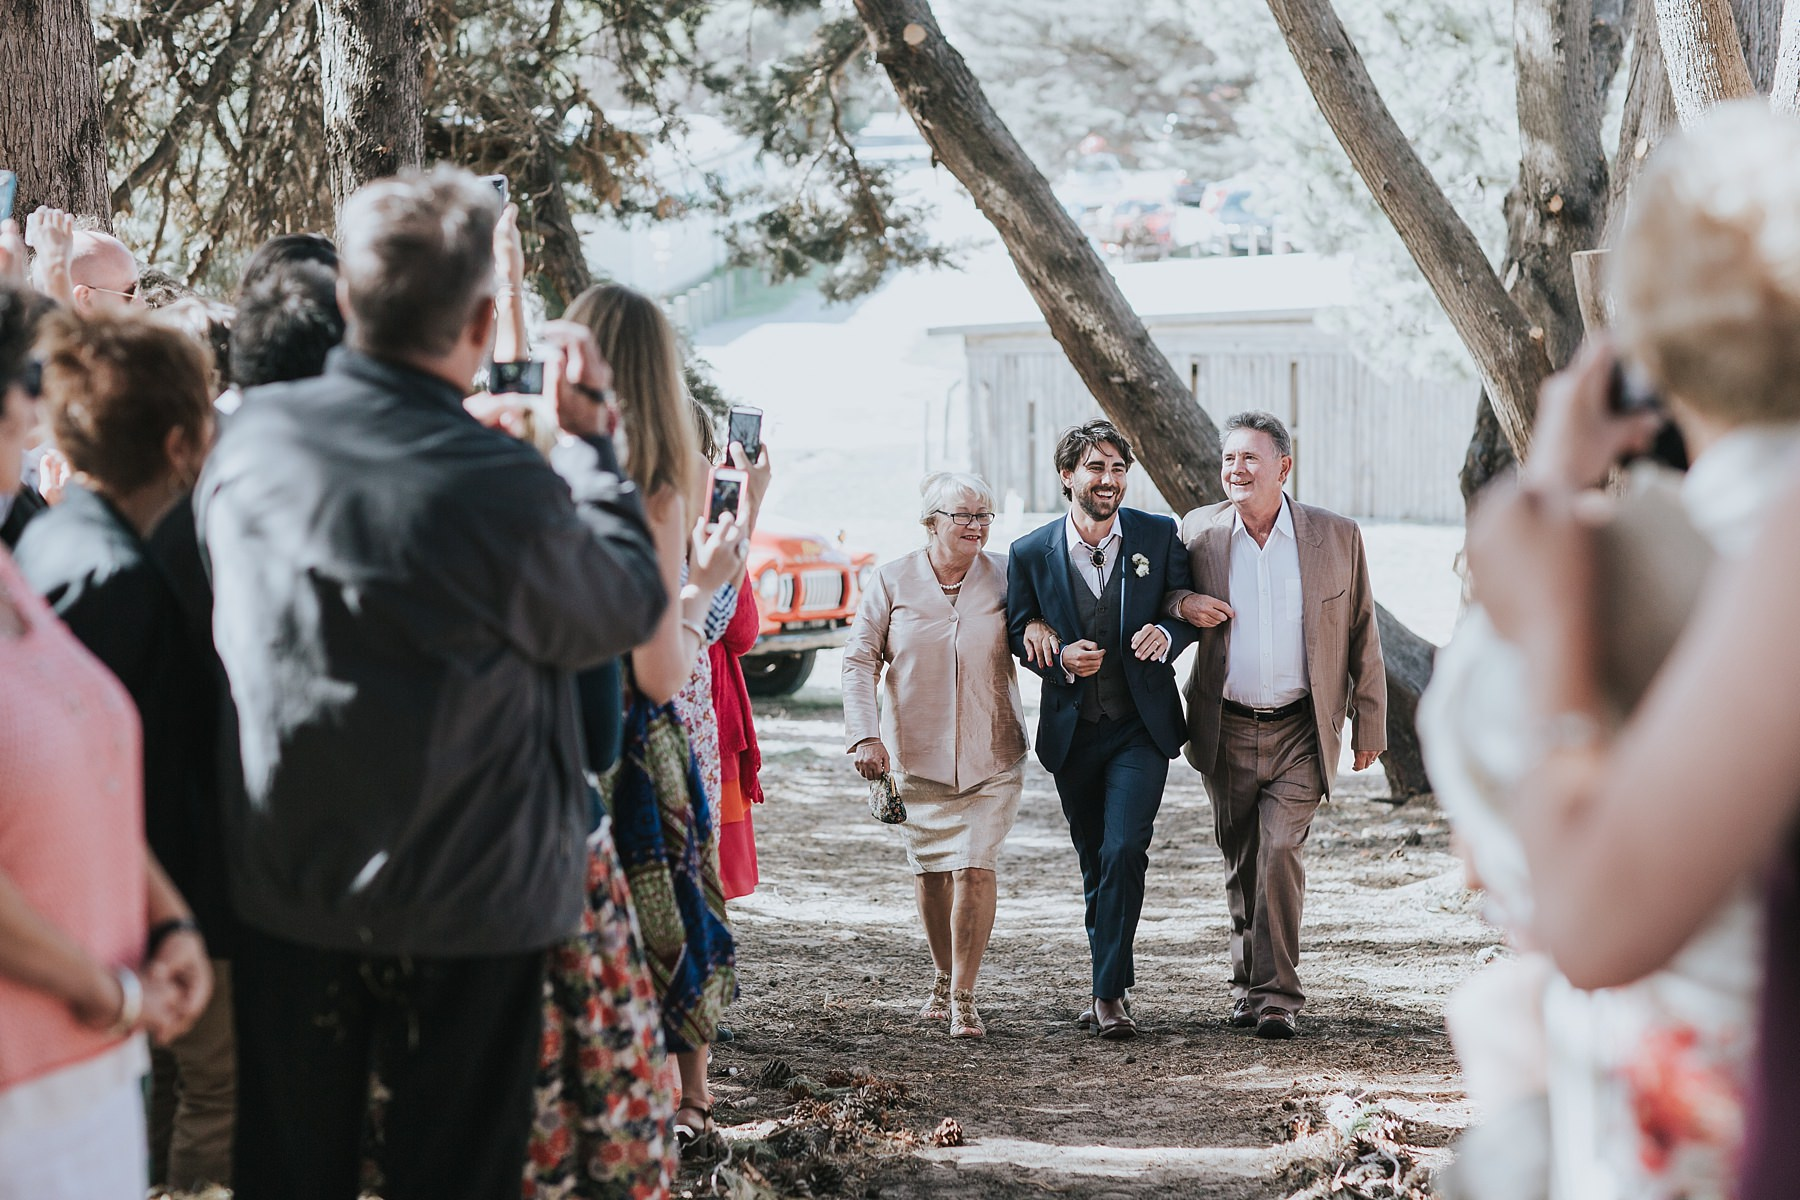 grooms parents walking him down the aisle